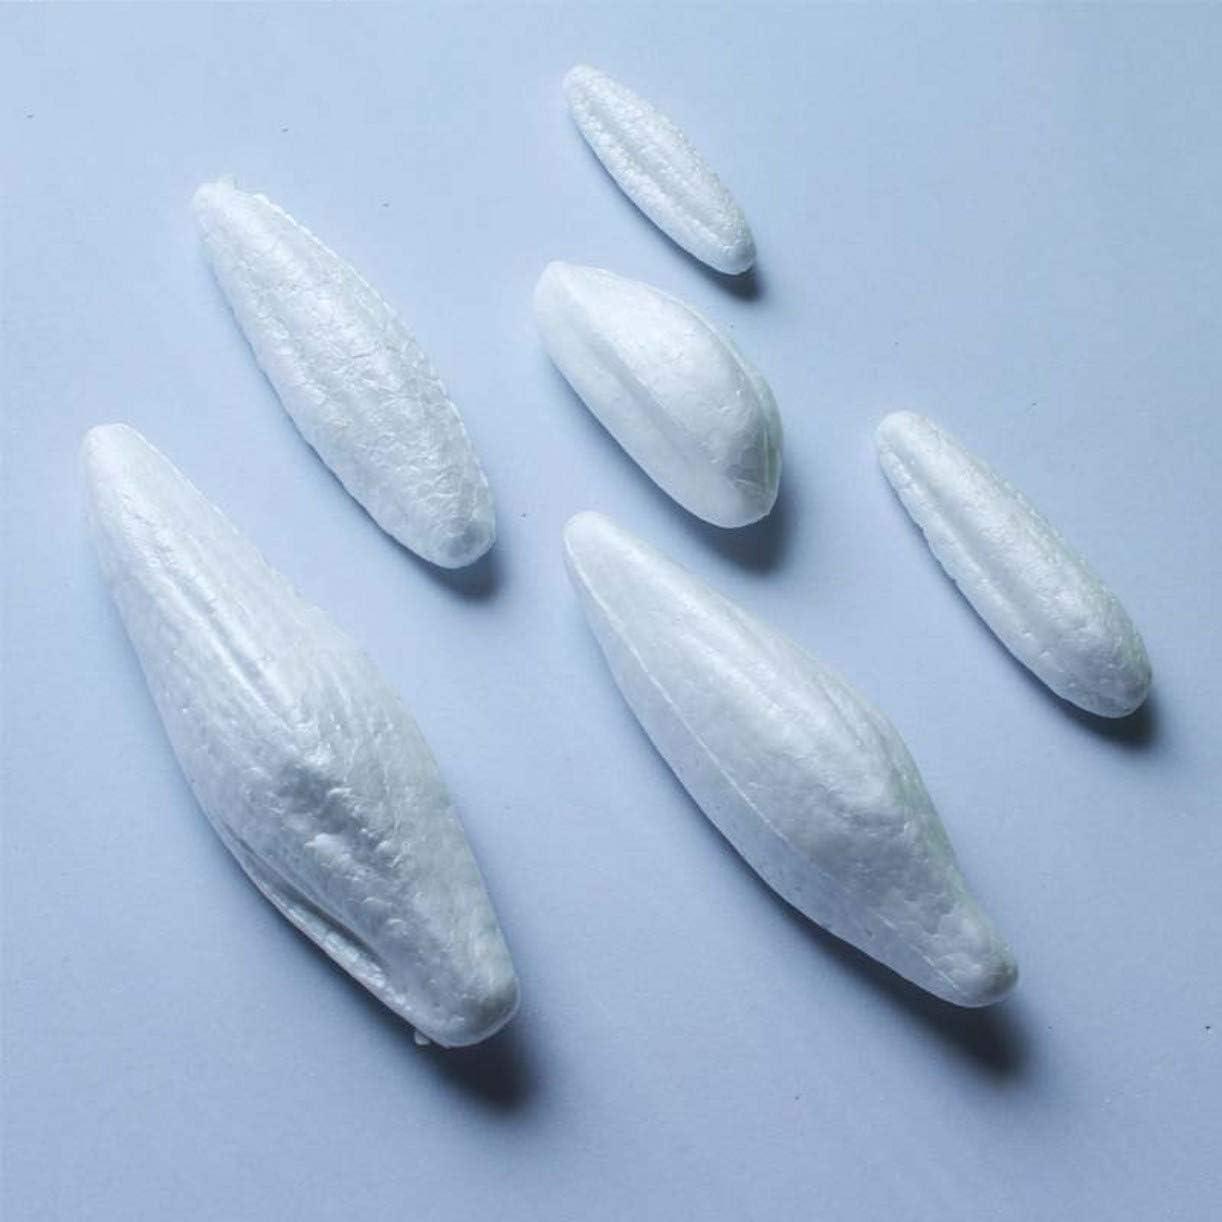 WellieSTR 60Pcs low-pricing 6 Size White Foam Nylon Flo Stocking Lily 5% OFF Buds